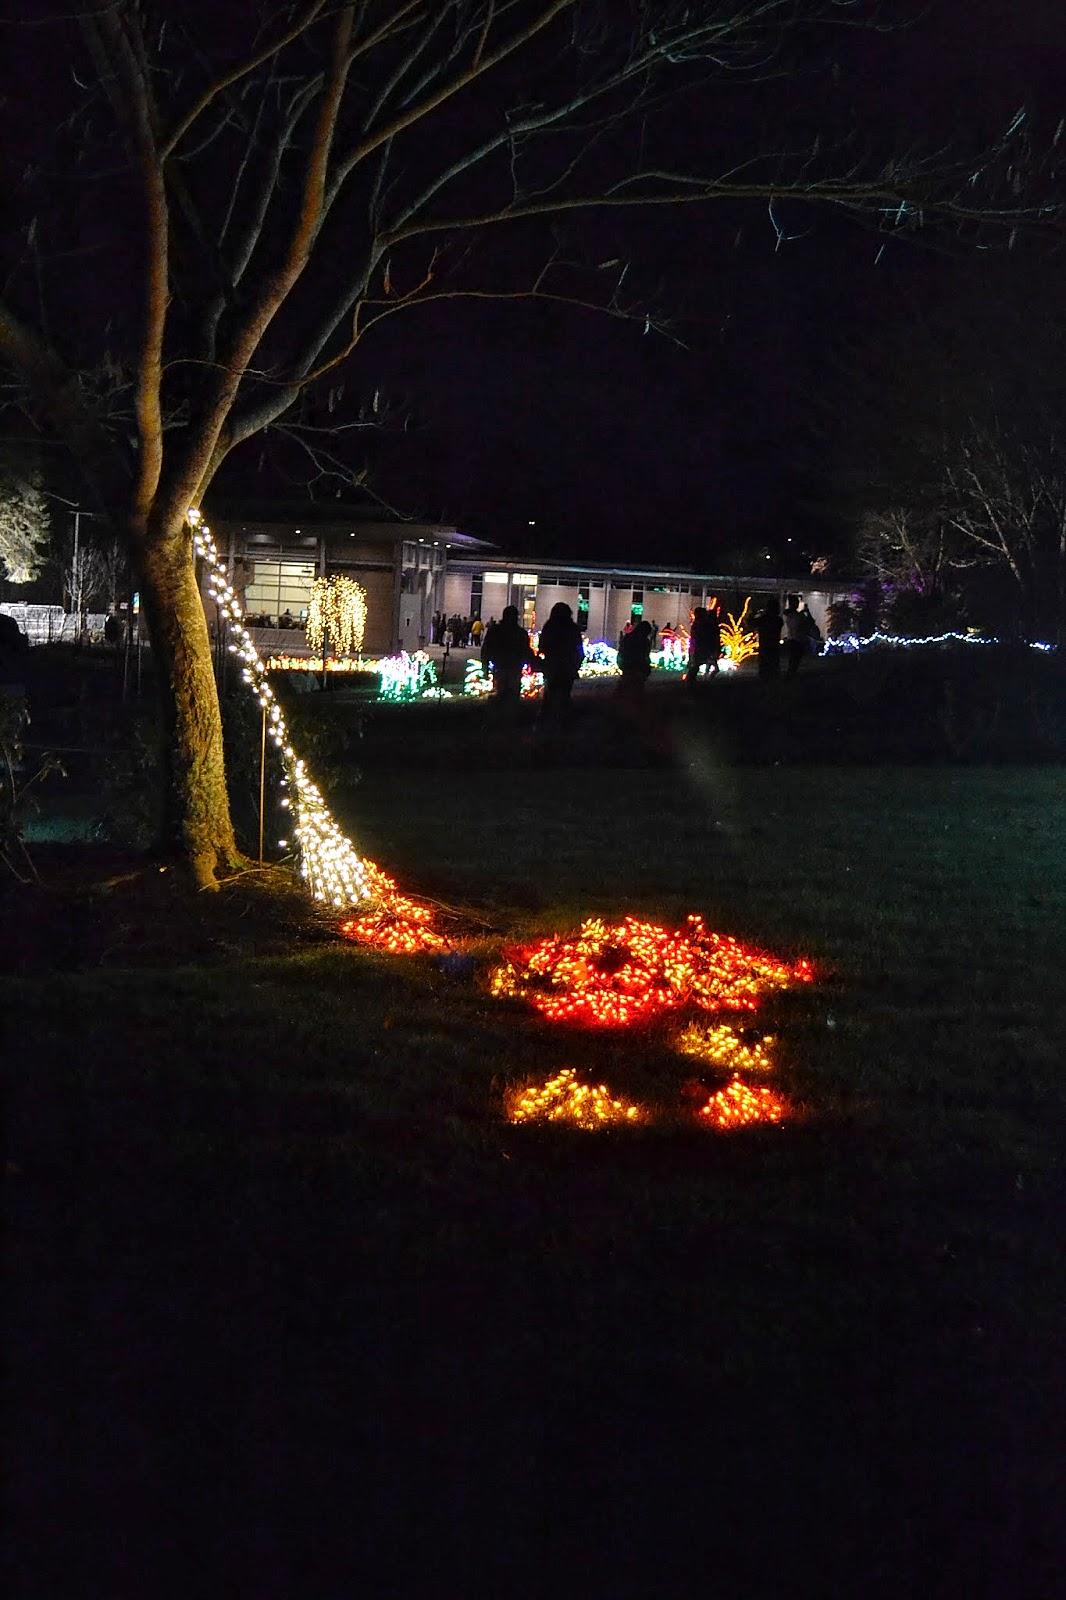 The Outlaw Gardener Garden D 39 Lights At Bellevue Botanical